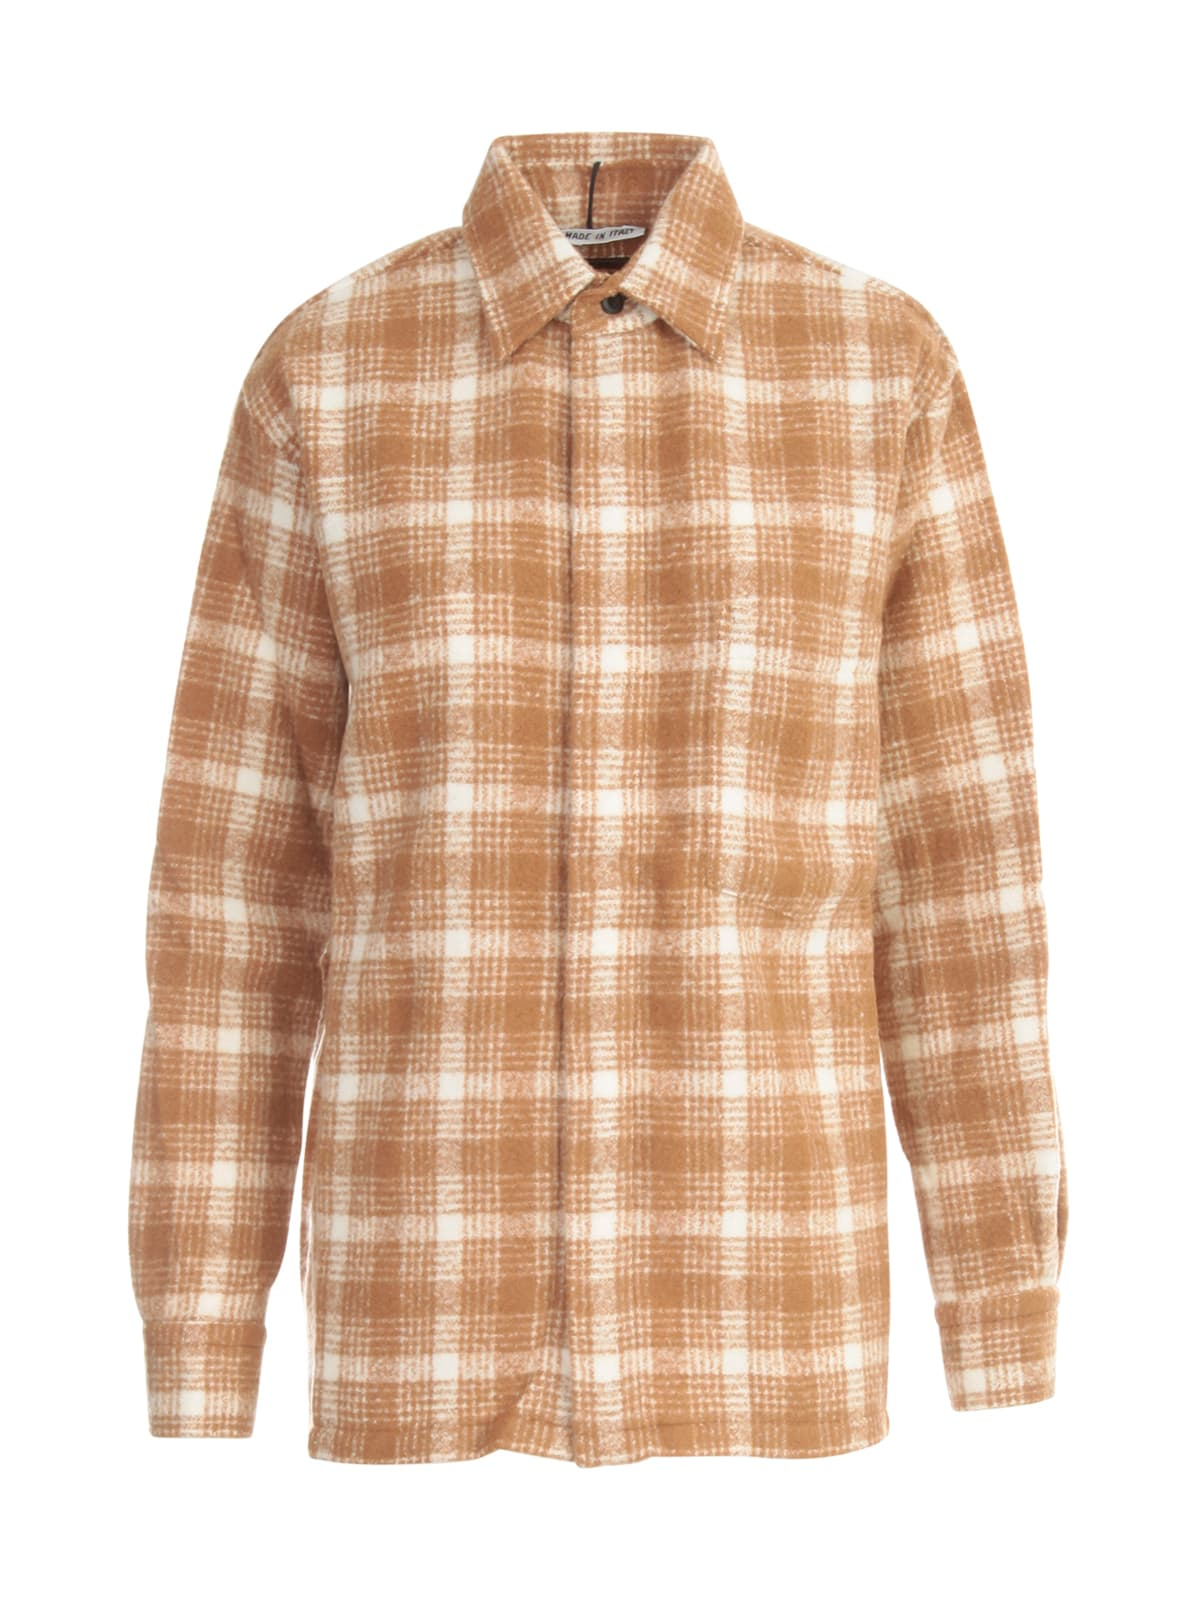 Walrus Unice Shirt